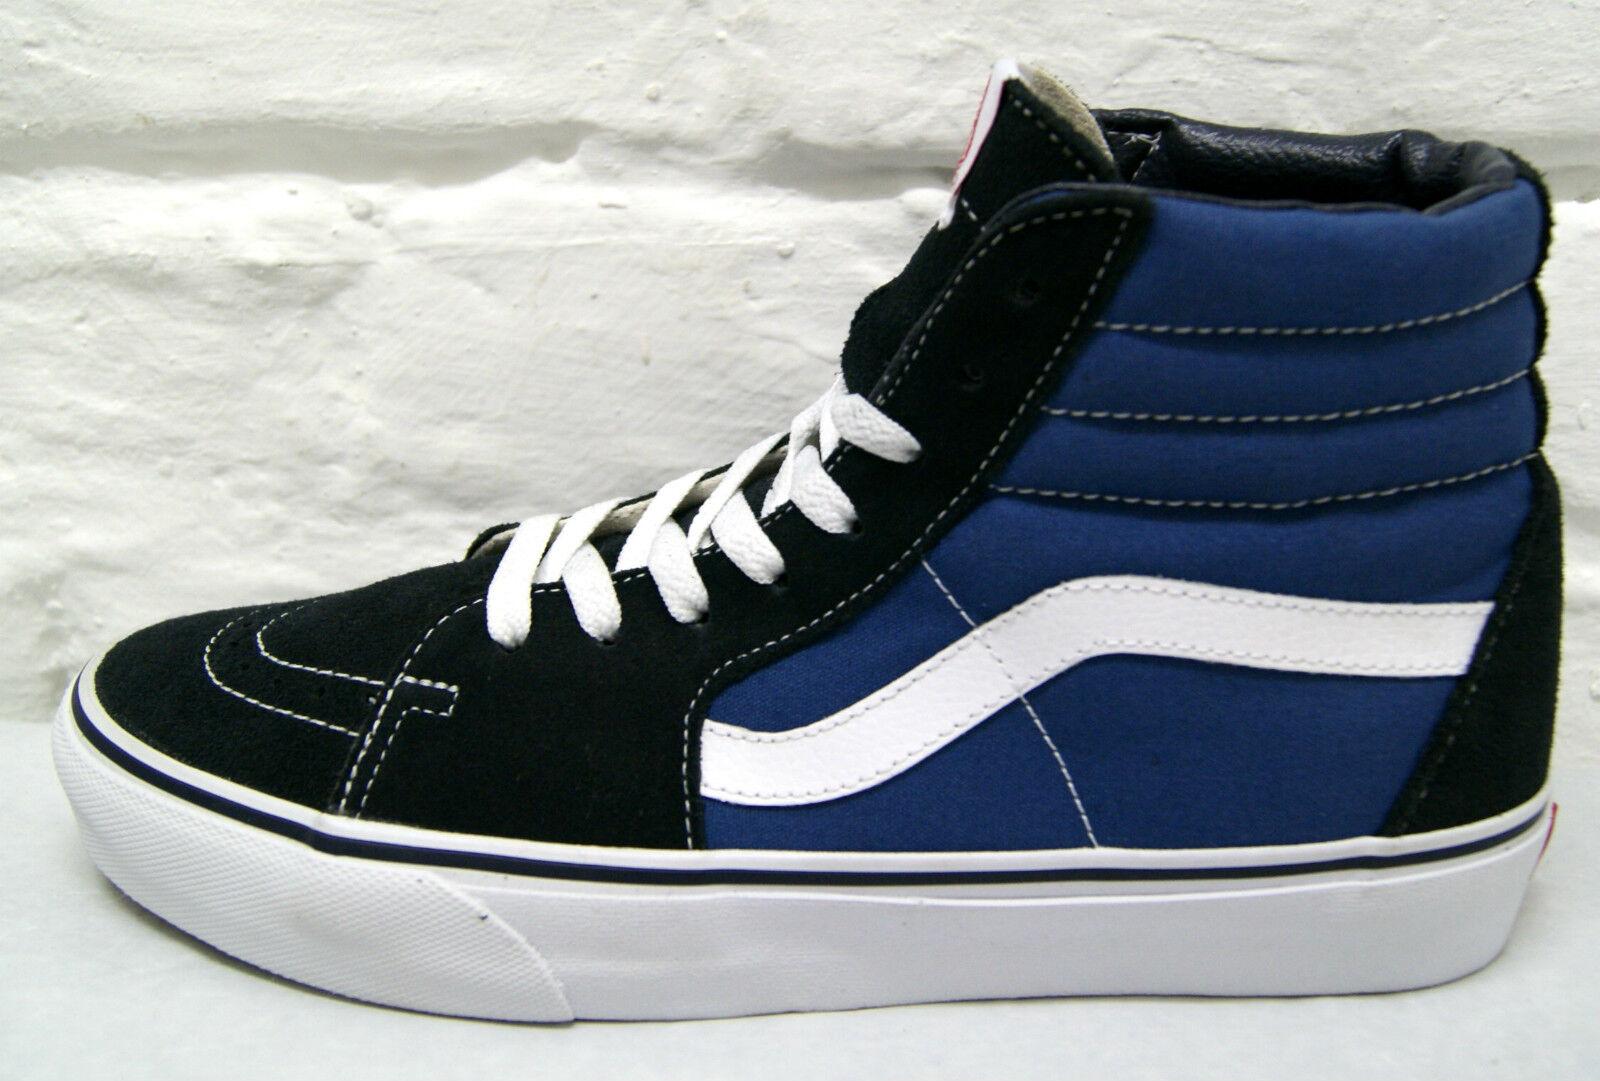 Vans SK8-Hi Schuh Skateboarding/Longboarding Farbe Navy